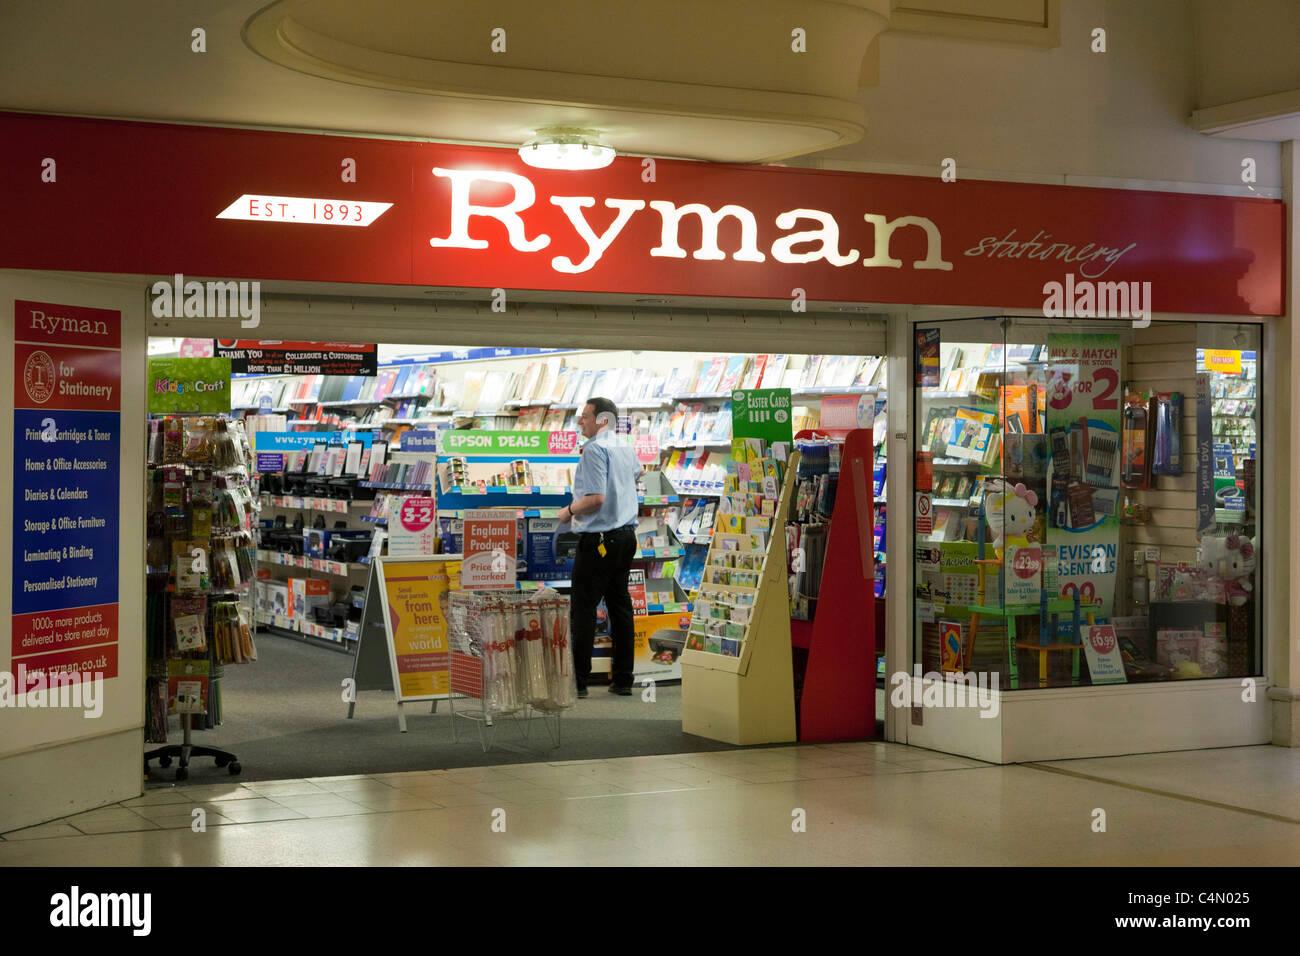 Ryman papeterie en UK Photo Stock